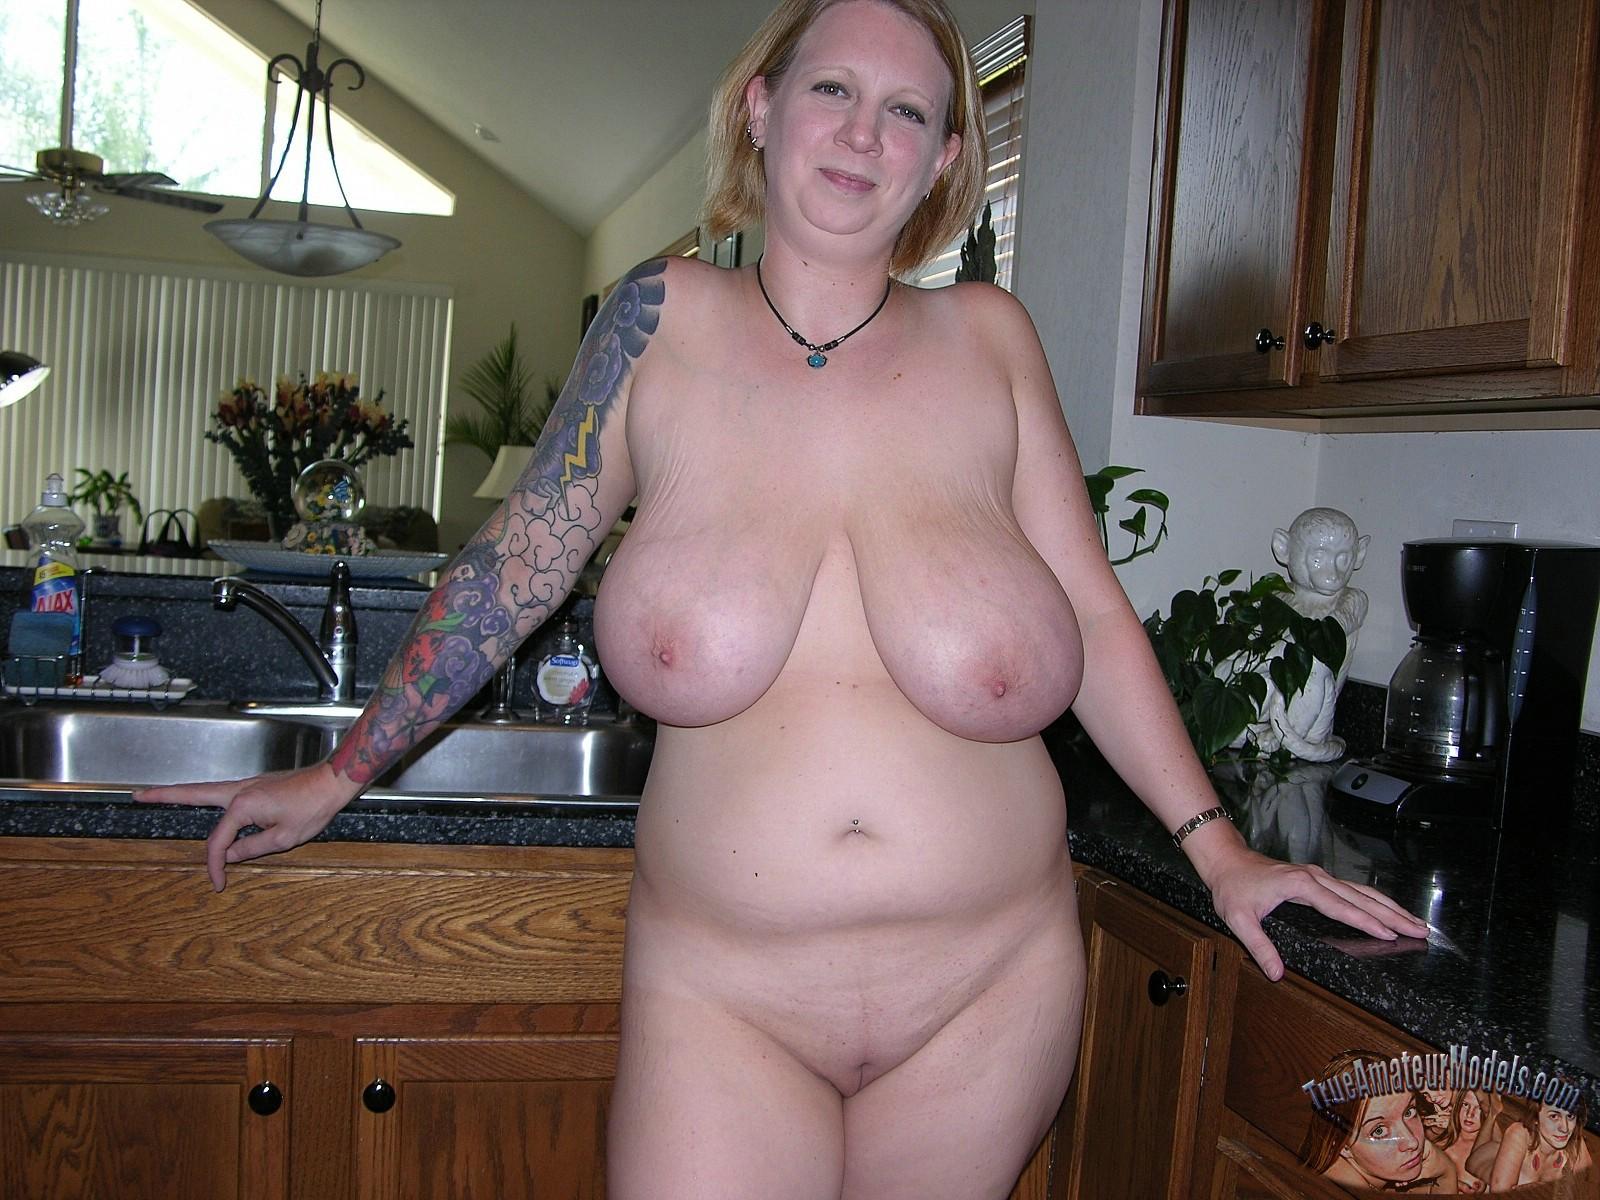 Big Tits Amateur Behind